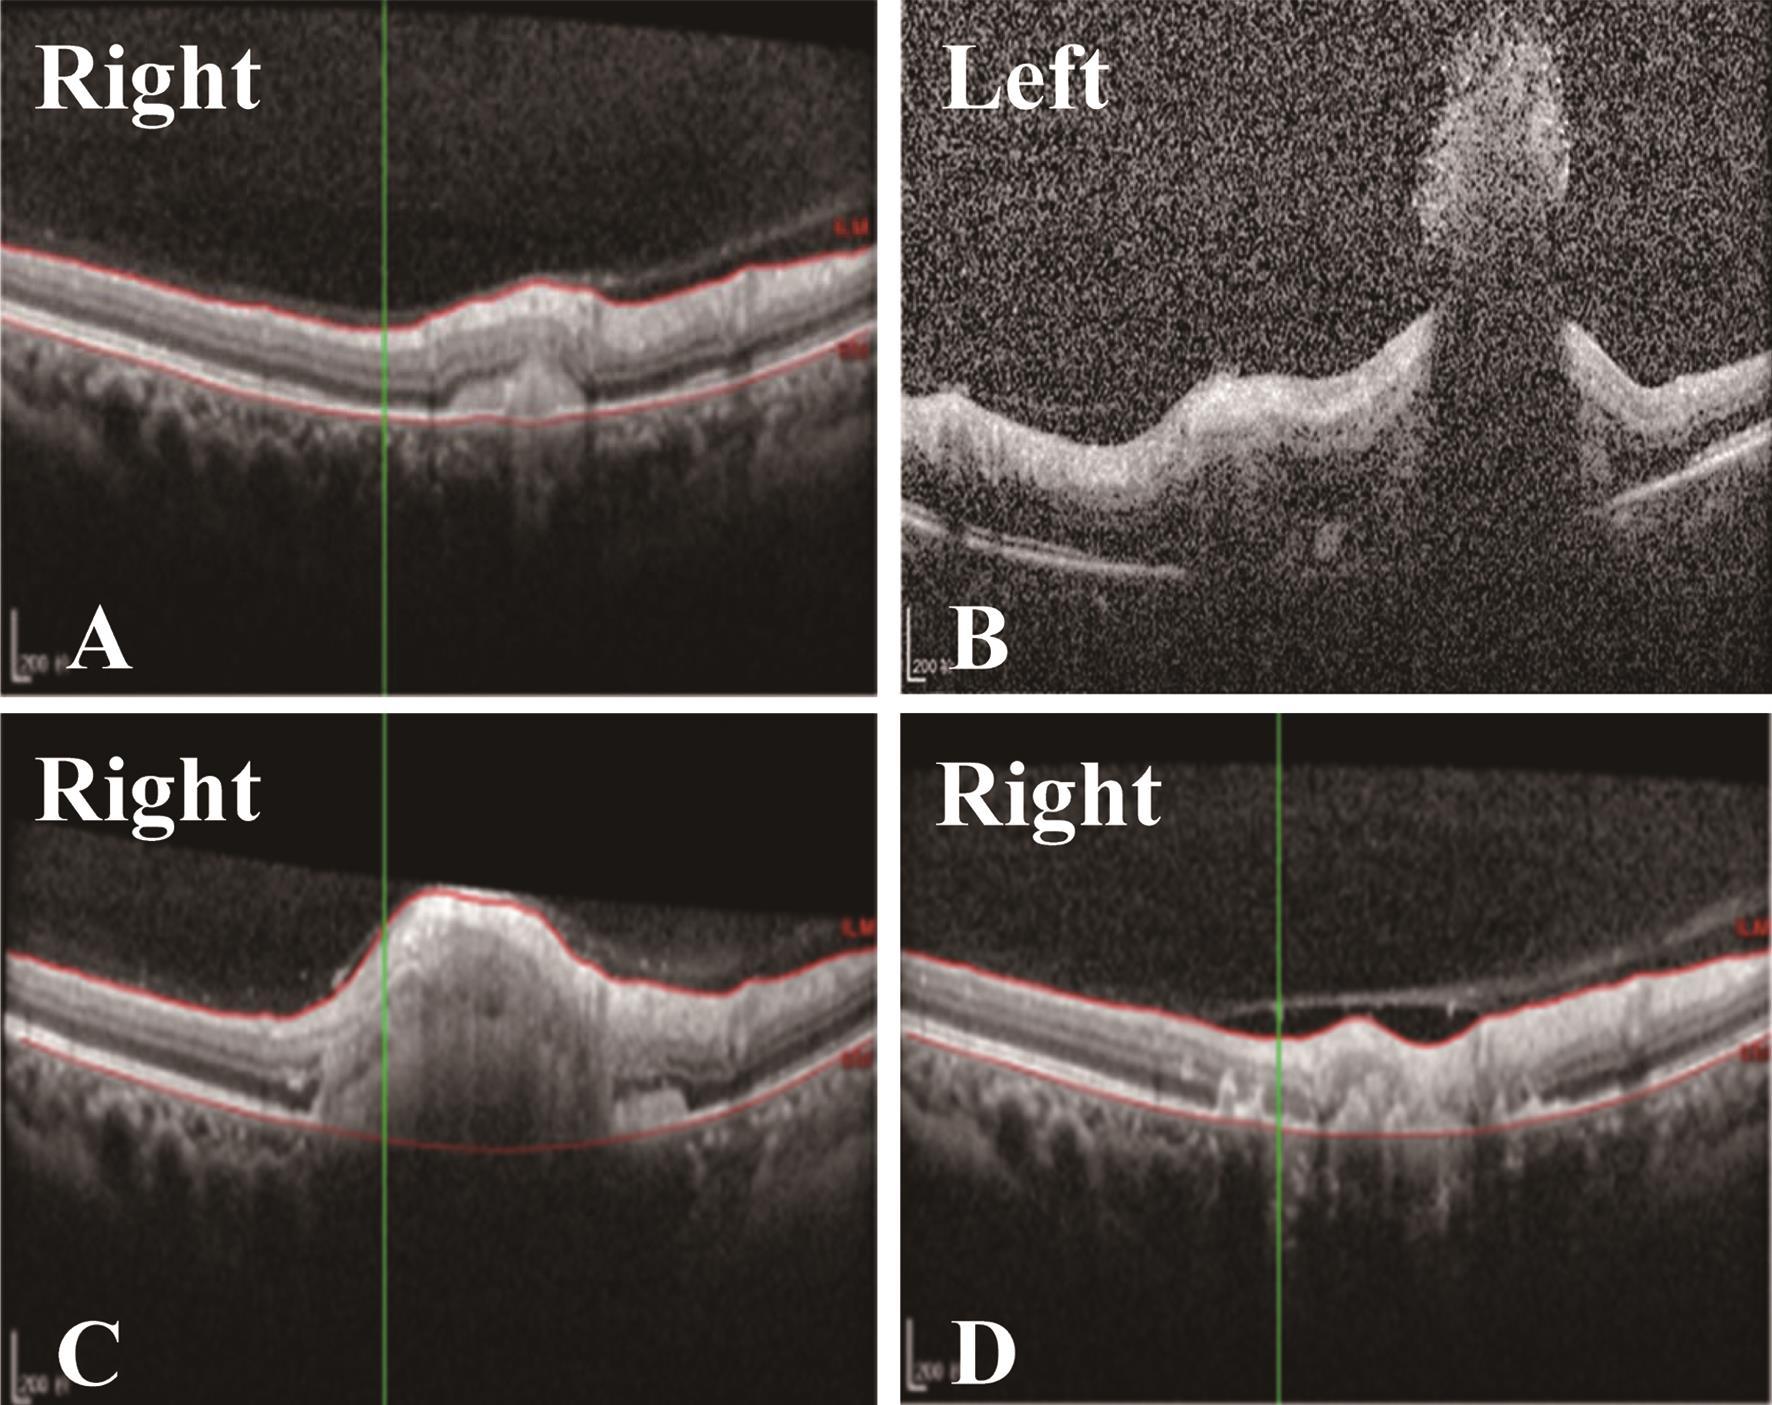 Eye optical coherence tomography images.